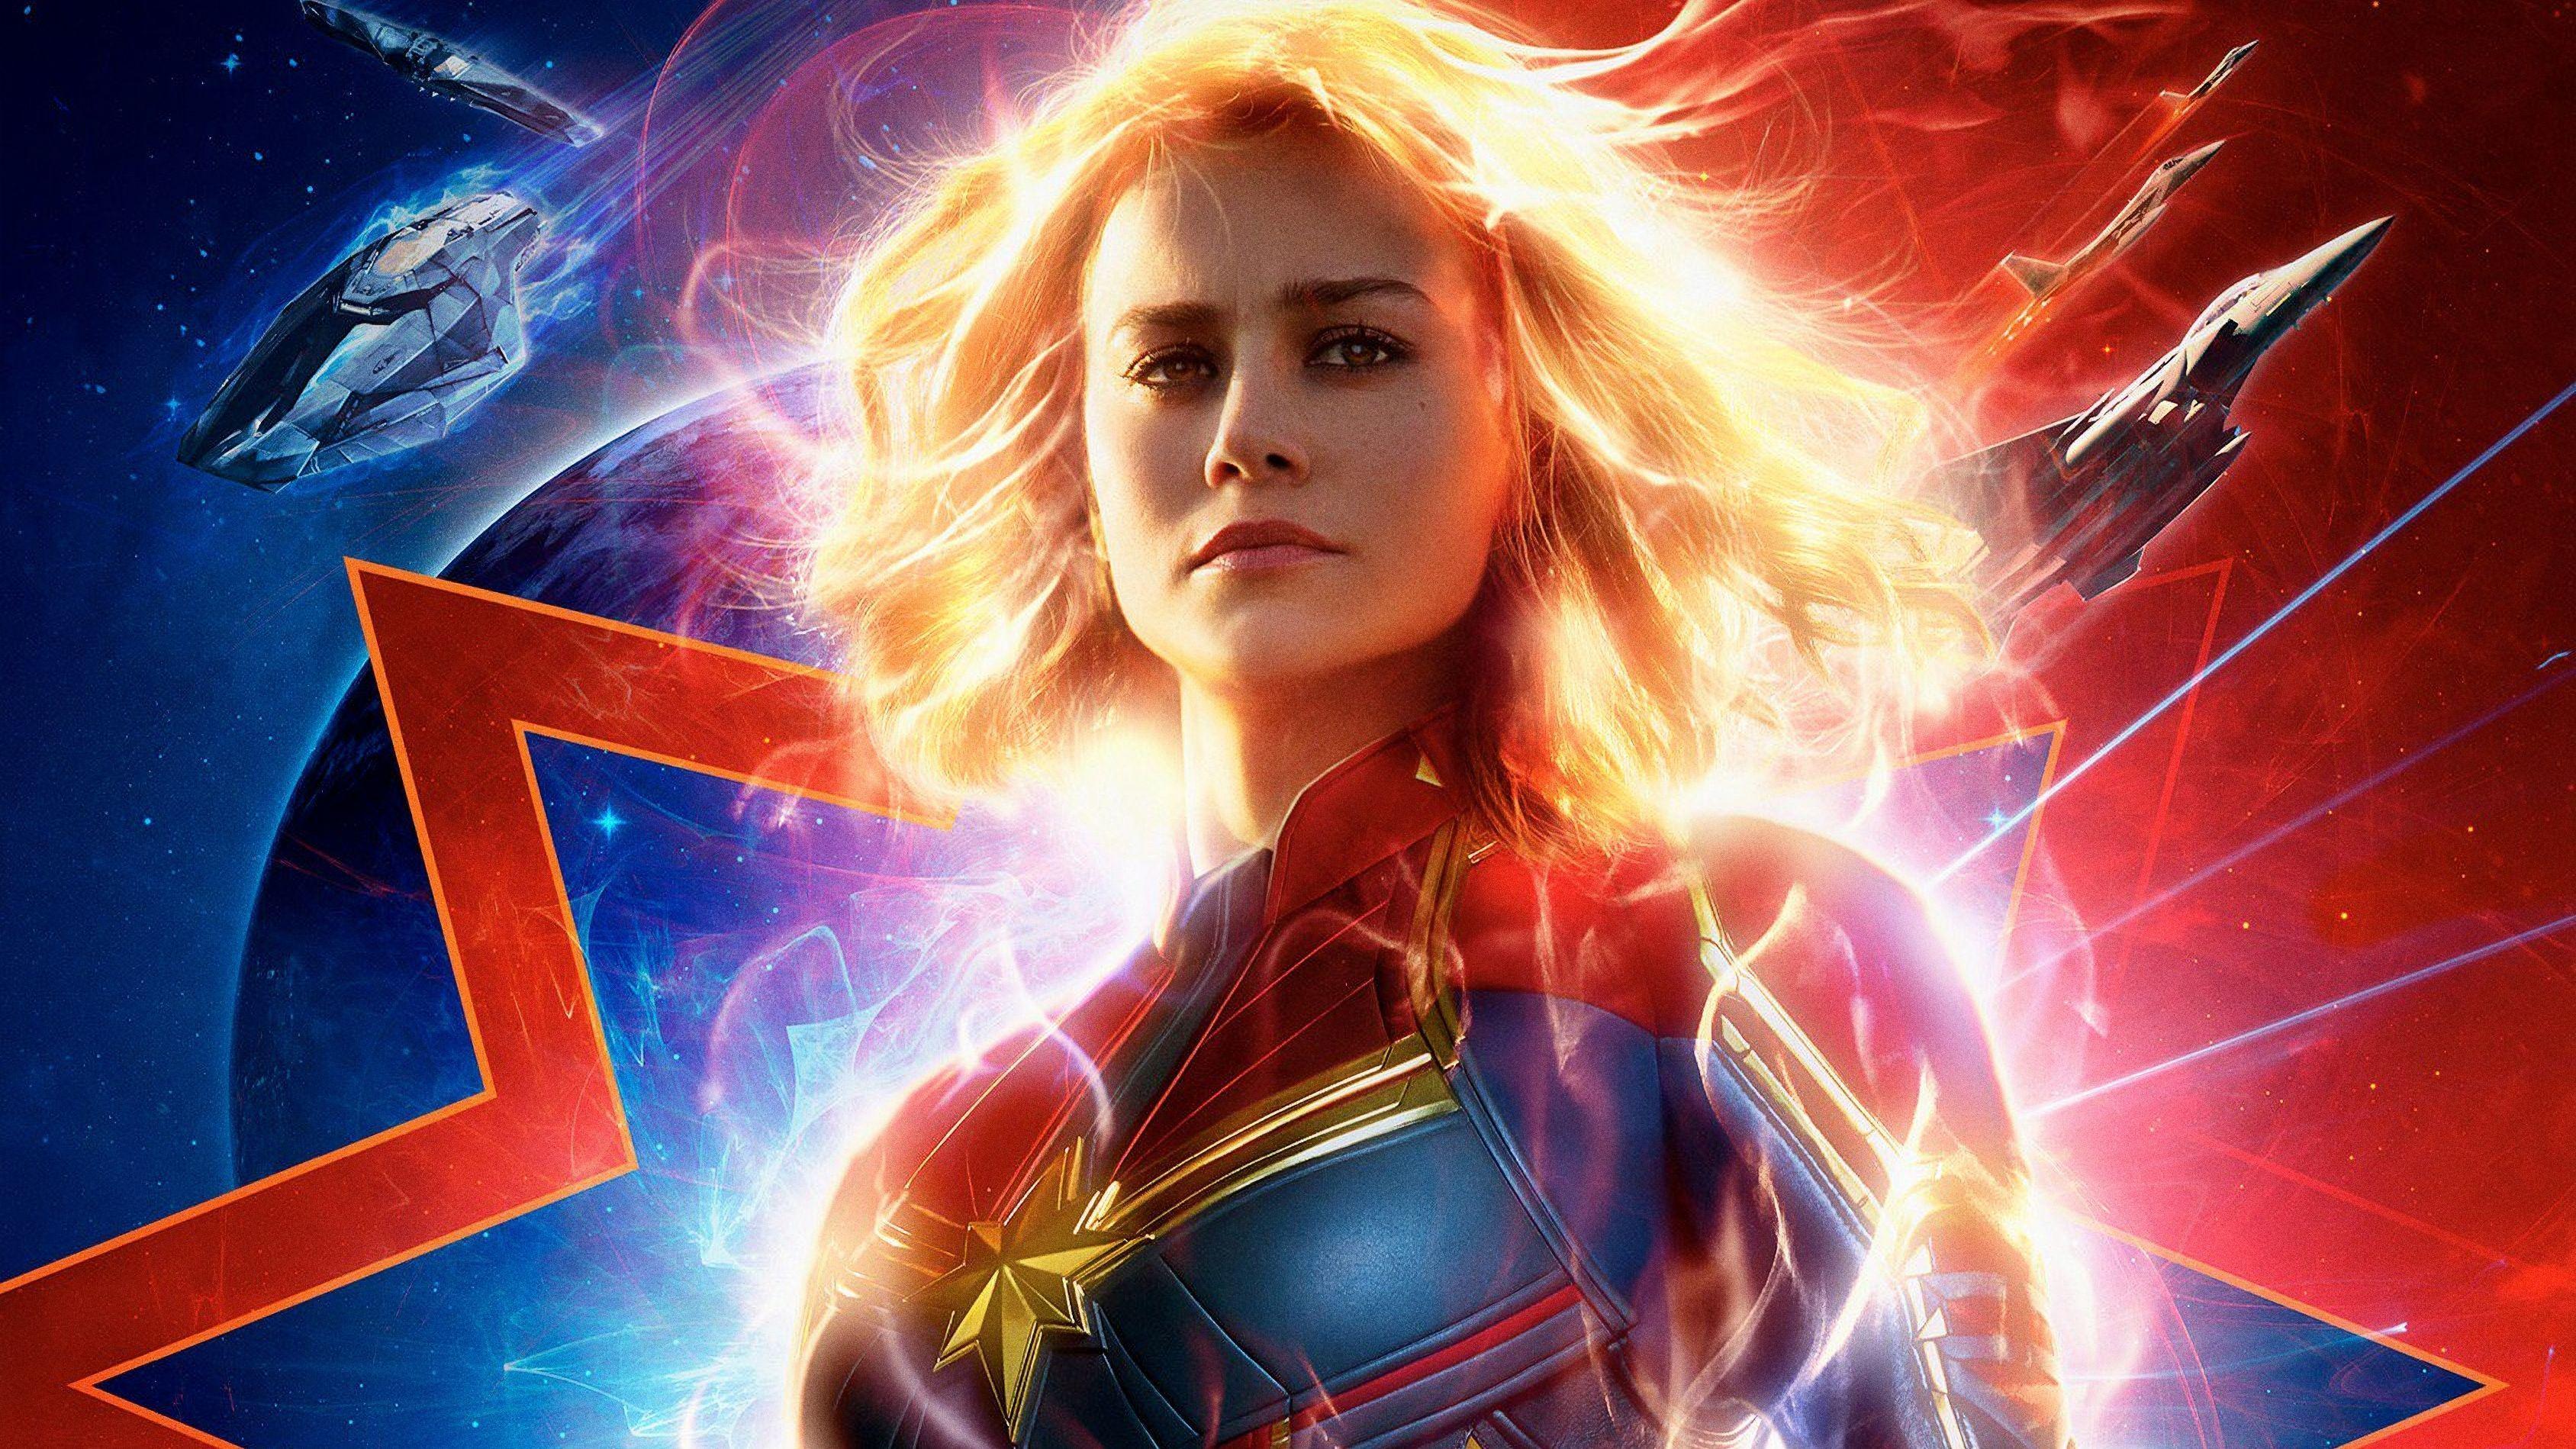 Captain Marvel 4k Wallpapers Top Free Captain Marvel 4k Backgrounds Wallpaperaccess